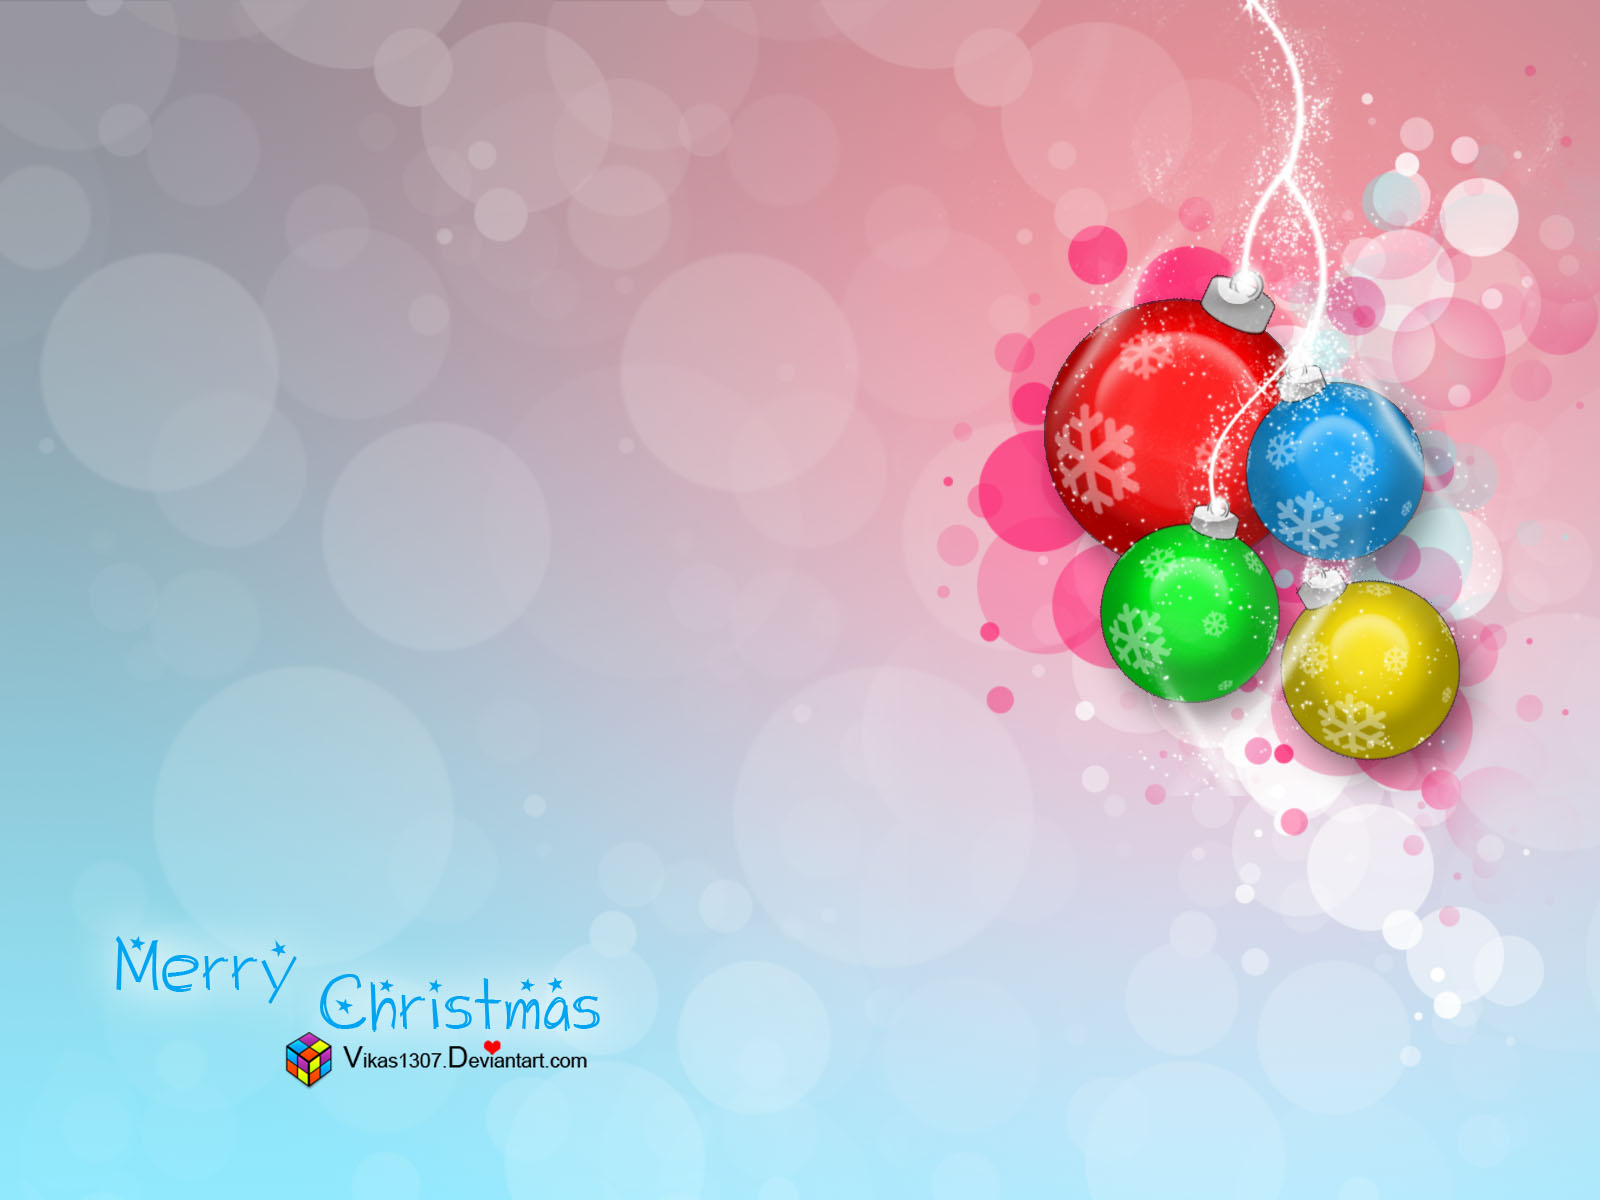 ...:: Merry Christmas :::.... by vikas1307